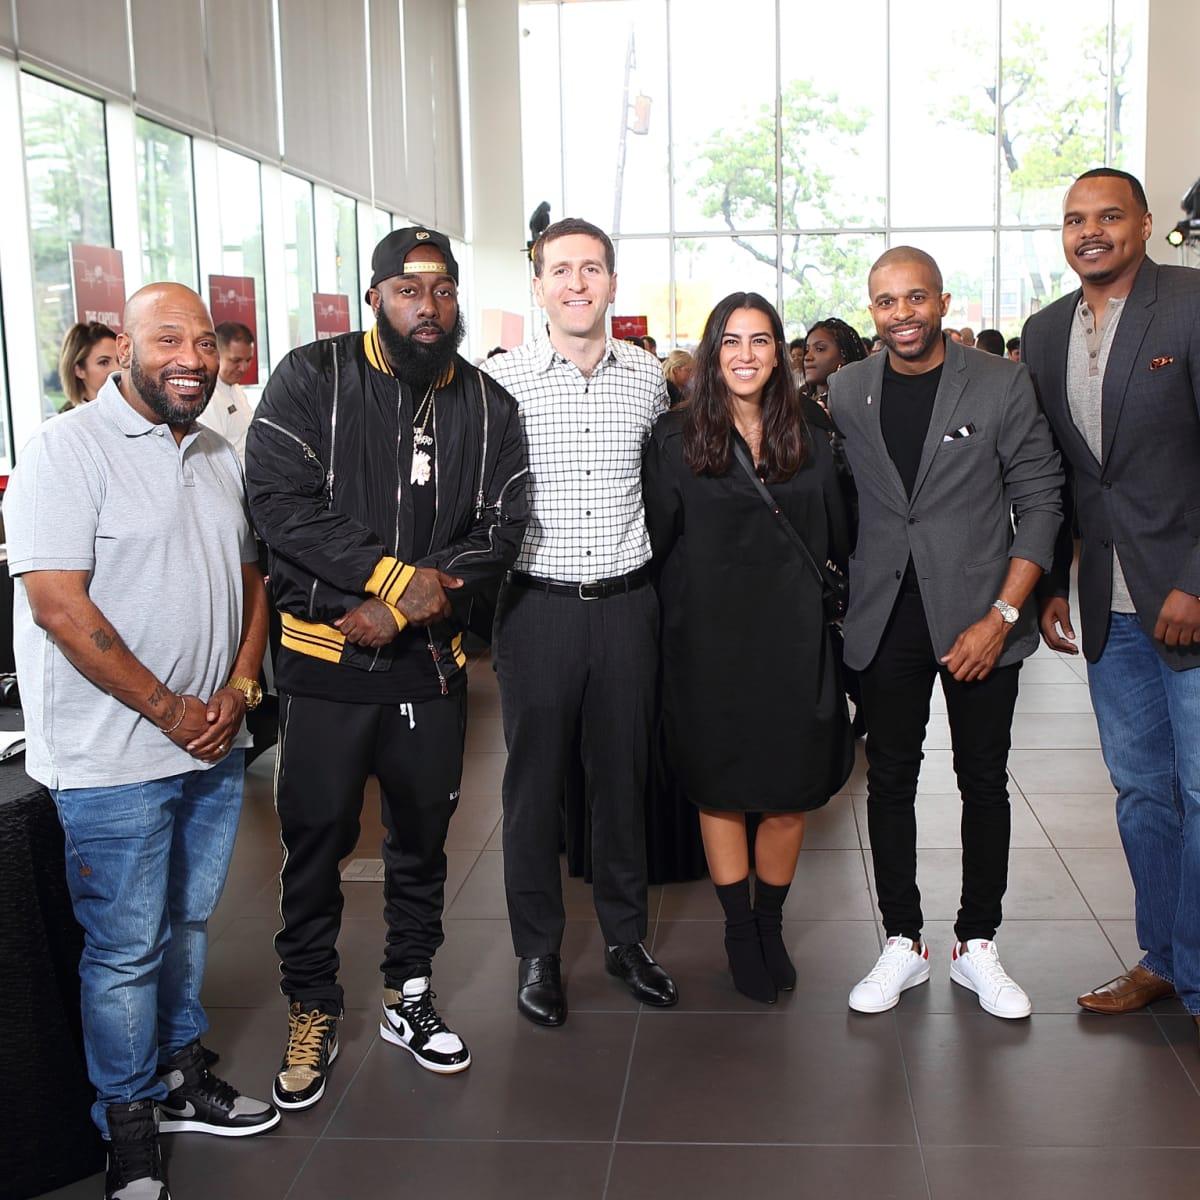 Big Brothers Big Sisters Big Taste 2018 judges Bun B, Trae tha Truth, Adam Goldberg, Daniela Velasco, DJ Mr. Rogers, Chester Pitts